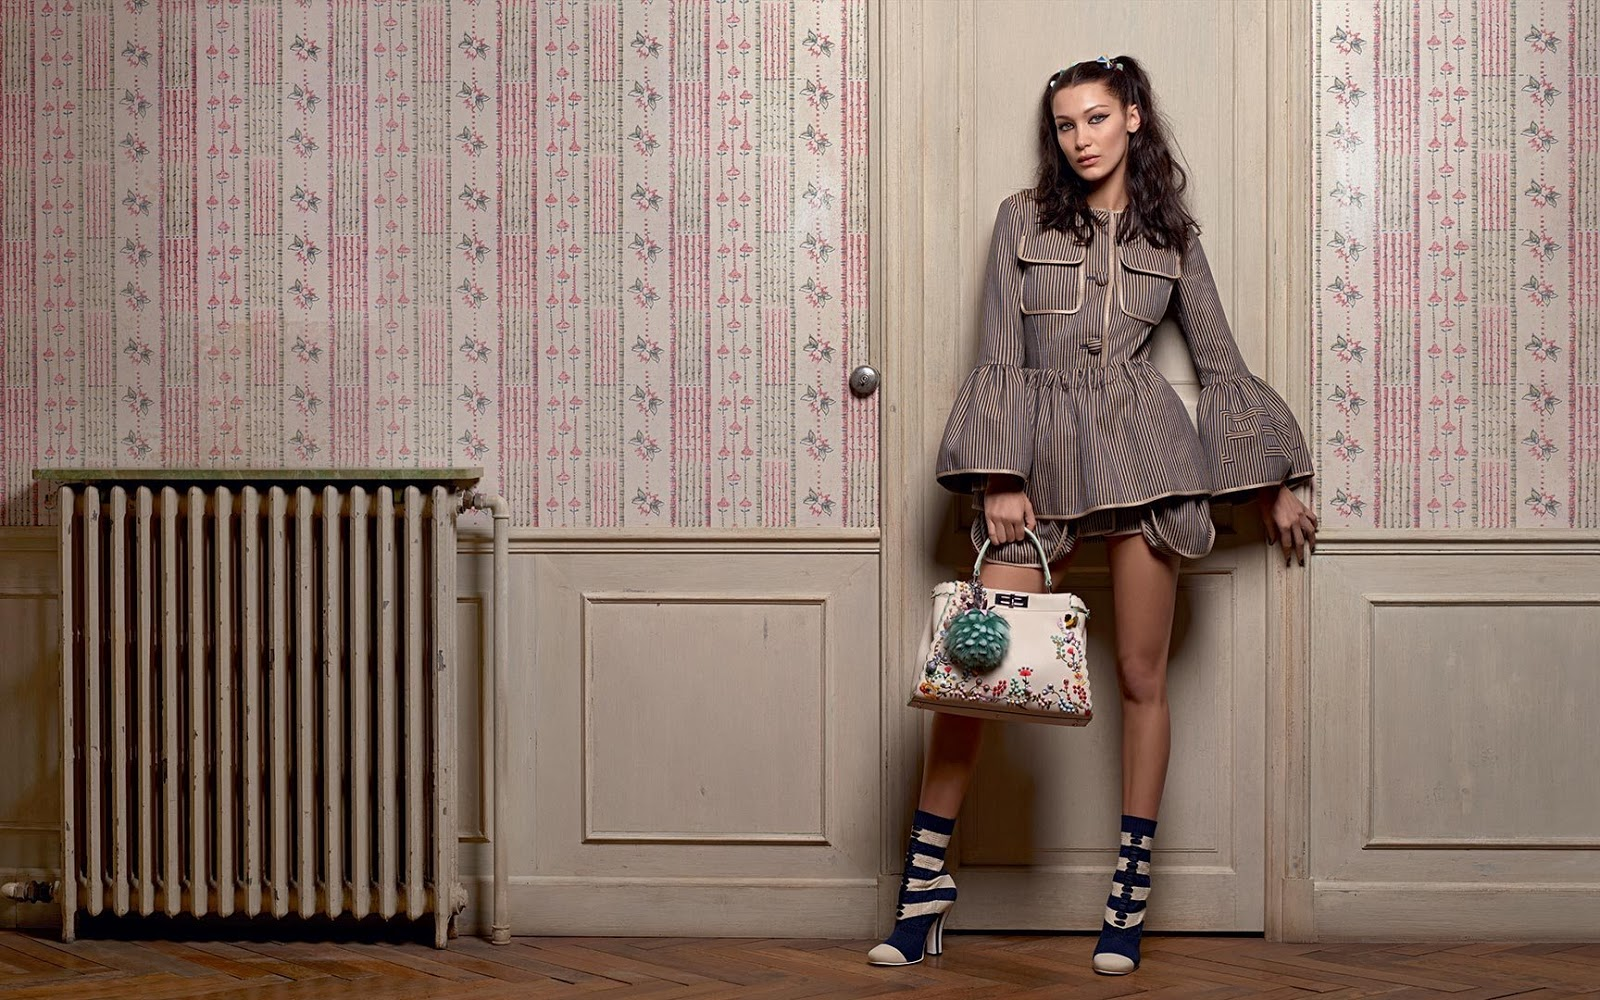 dc2a95dd435 GiGi   Bella Hadid Leads The Fashion Campaign - Zackylicious